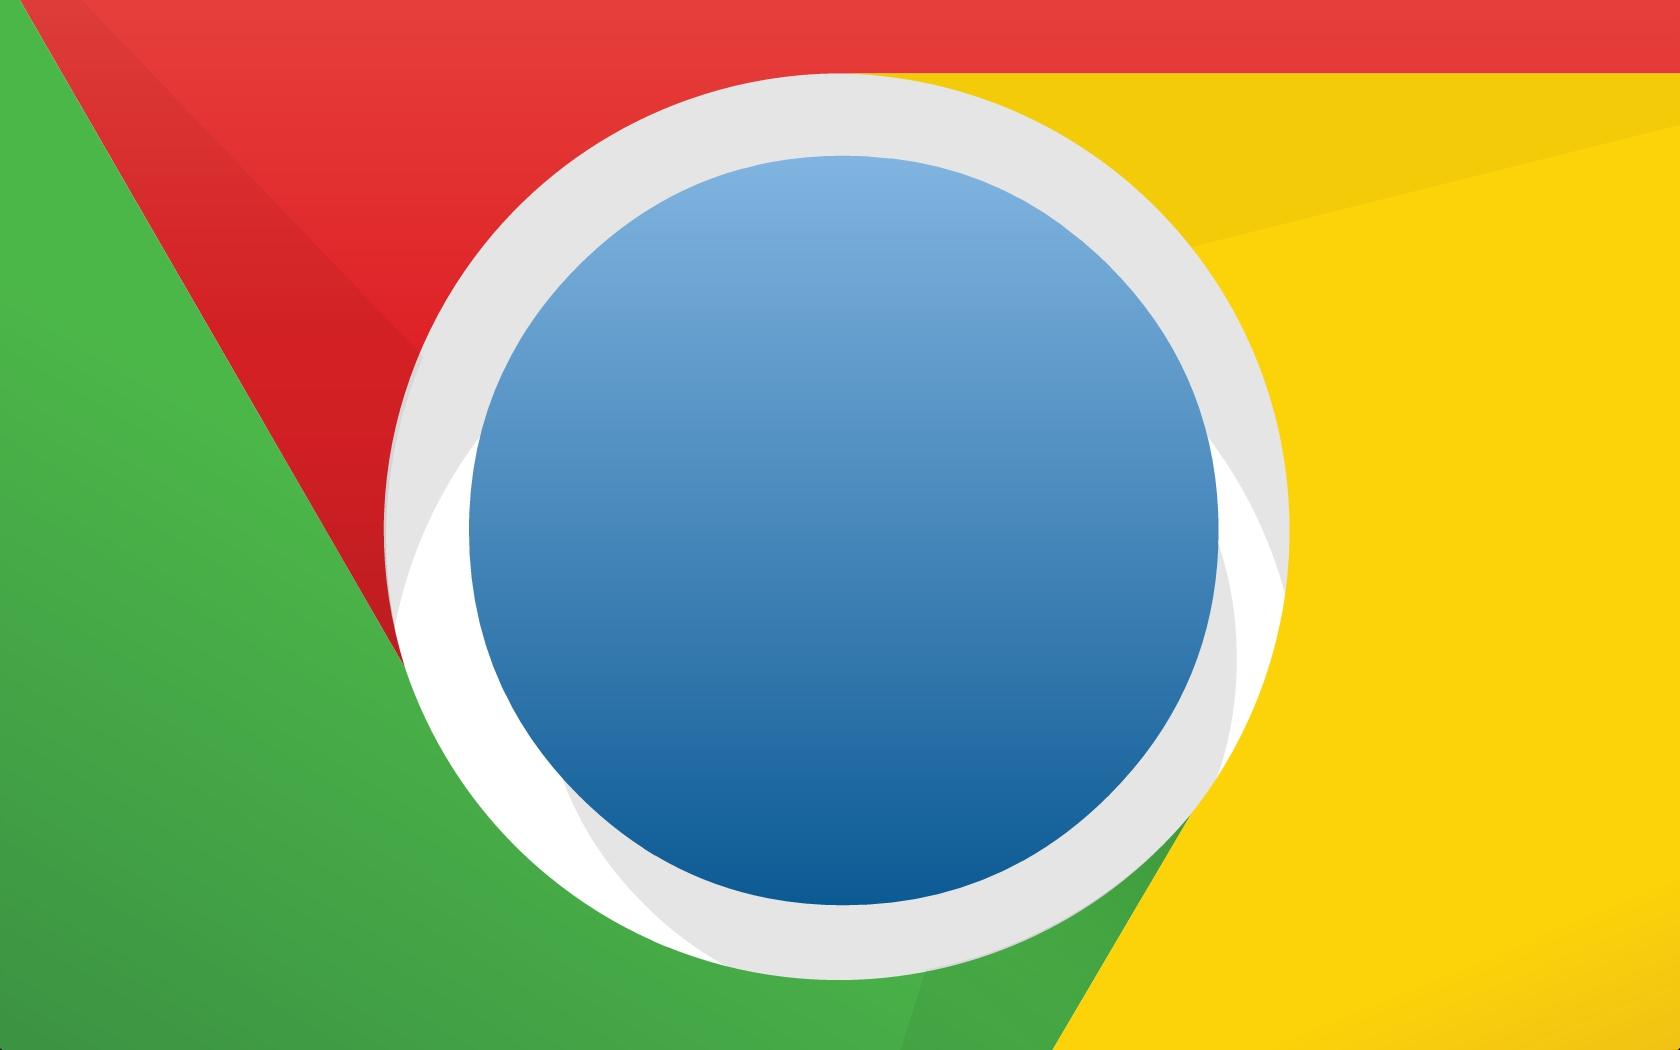 Chrome site isolation